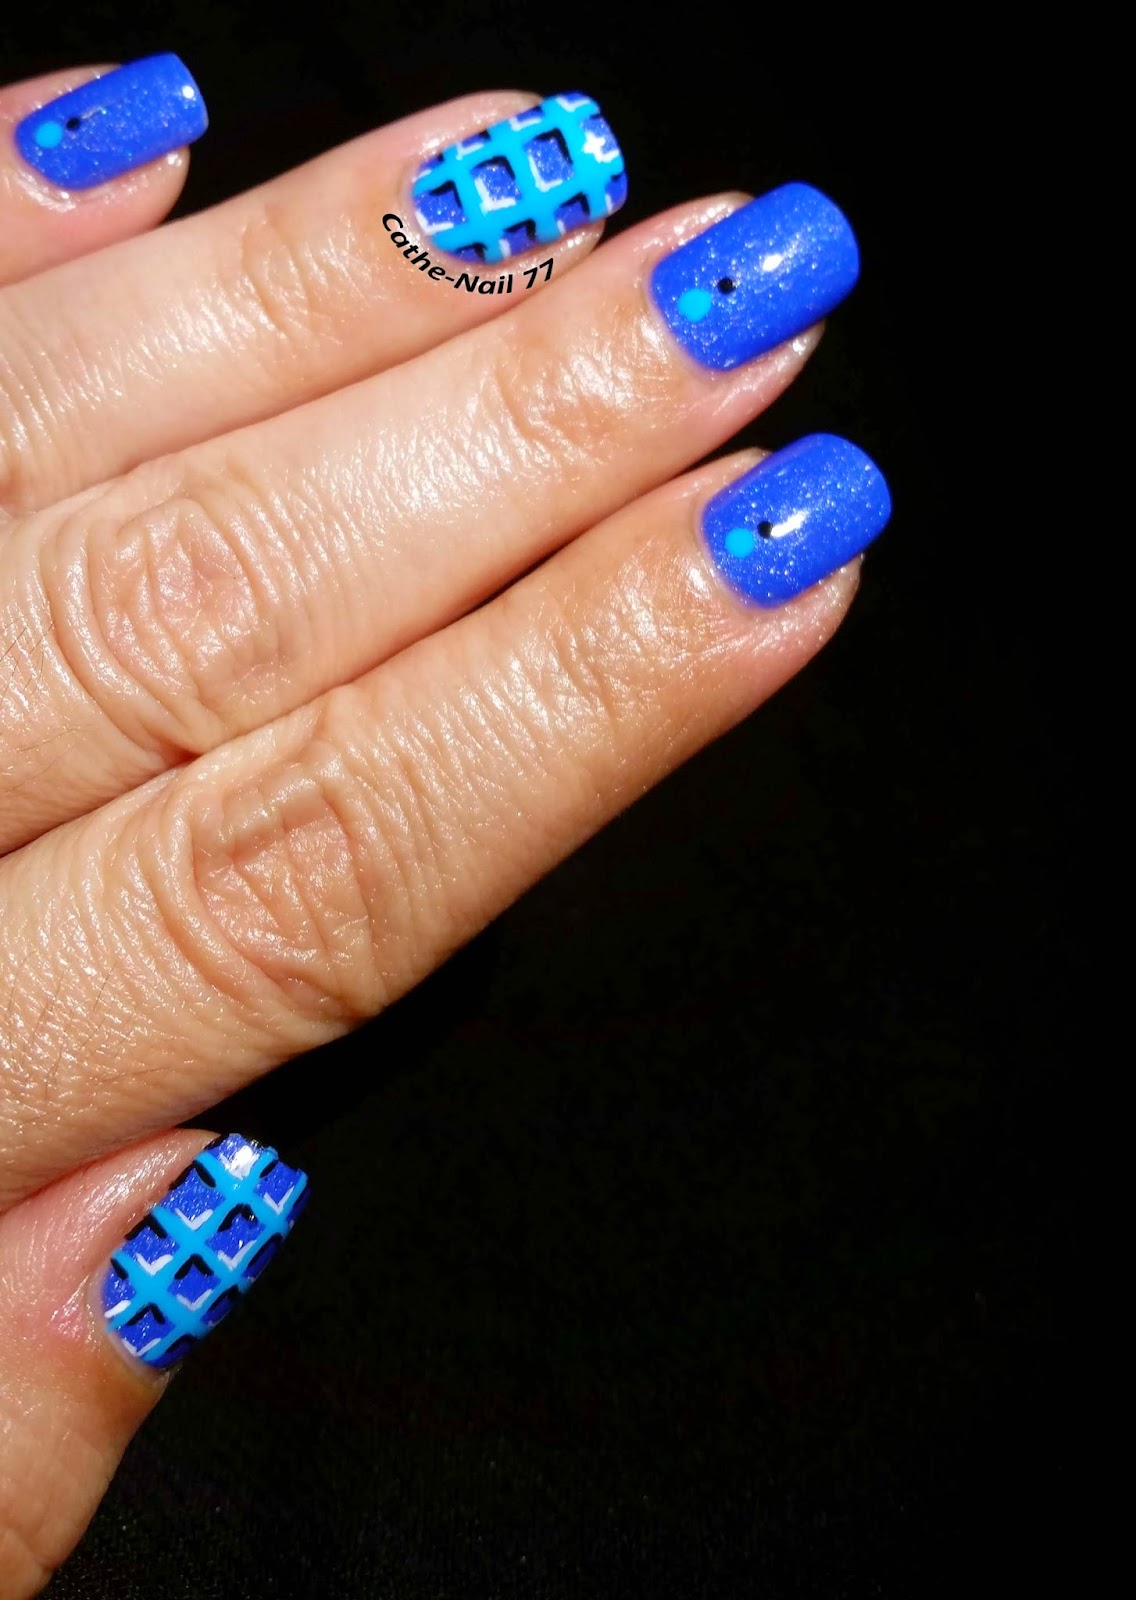 http://cathenail.blogspot.fr/2014/10/waffle-nails-repro-les-ongles-de-lucie.html